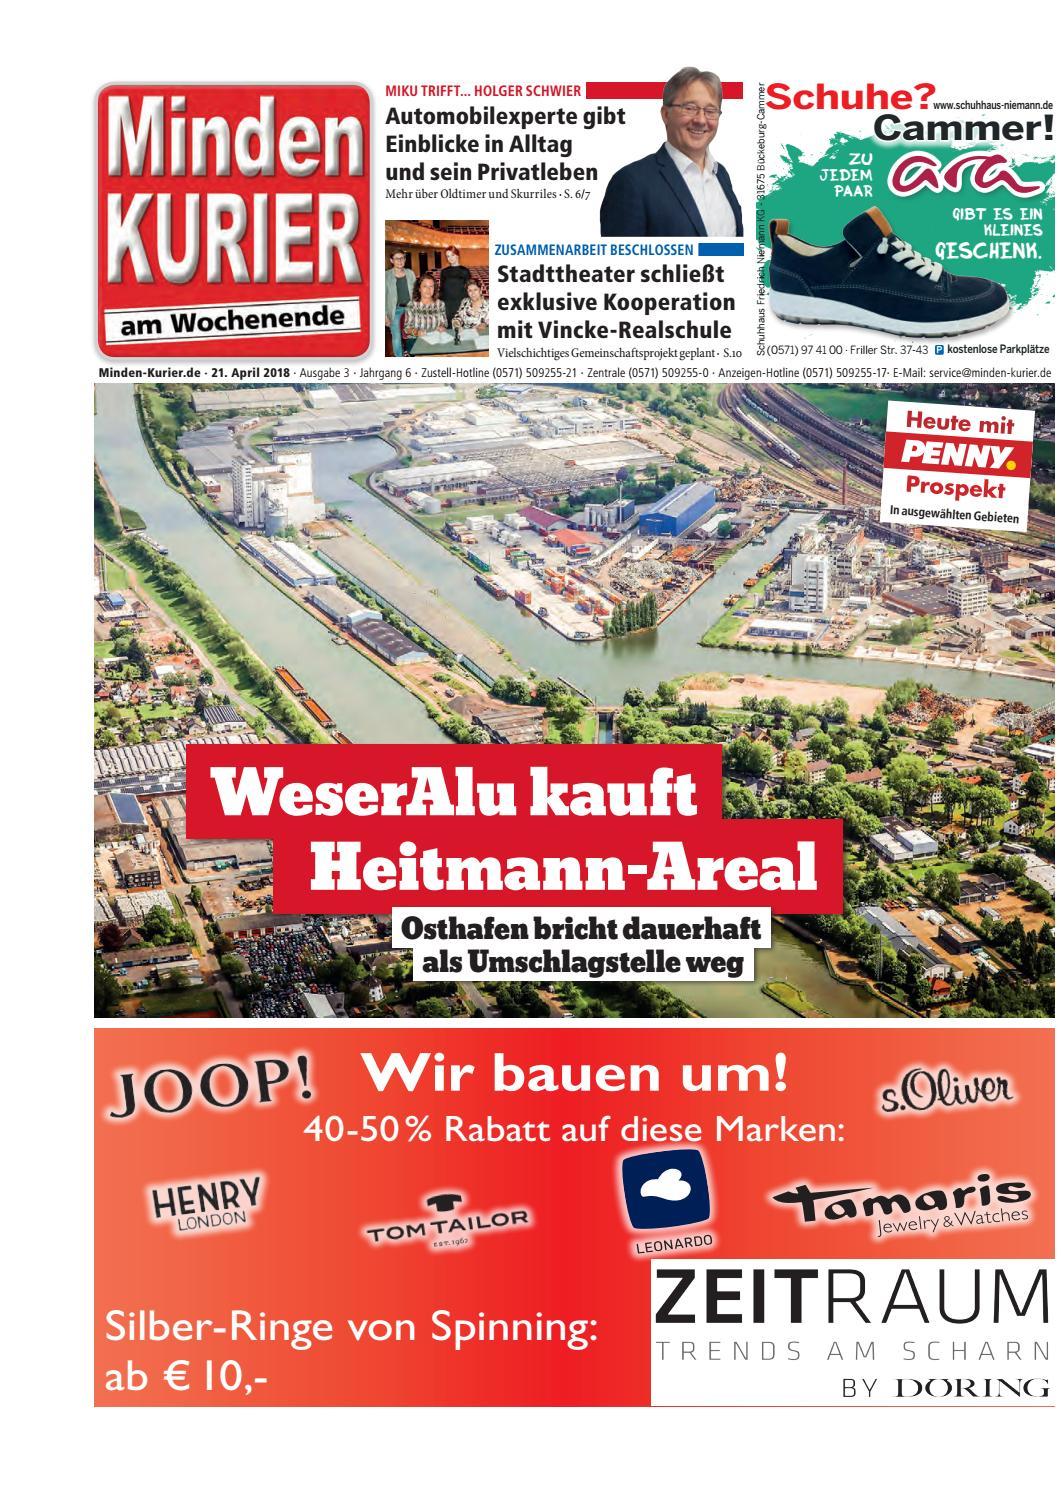 Perfekt 21. April 2018 U2013 WeserAlu Kauft Heitmann Areal By Minden Kurier Issuu